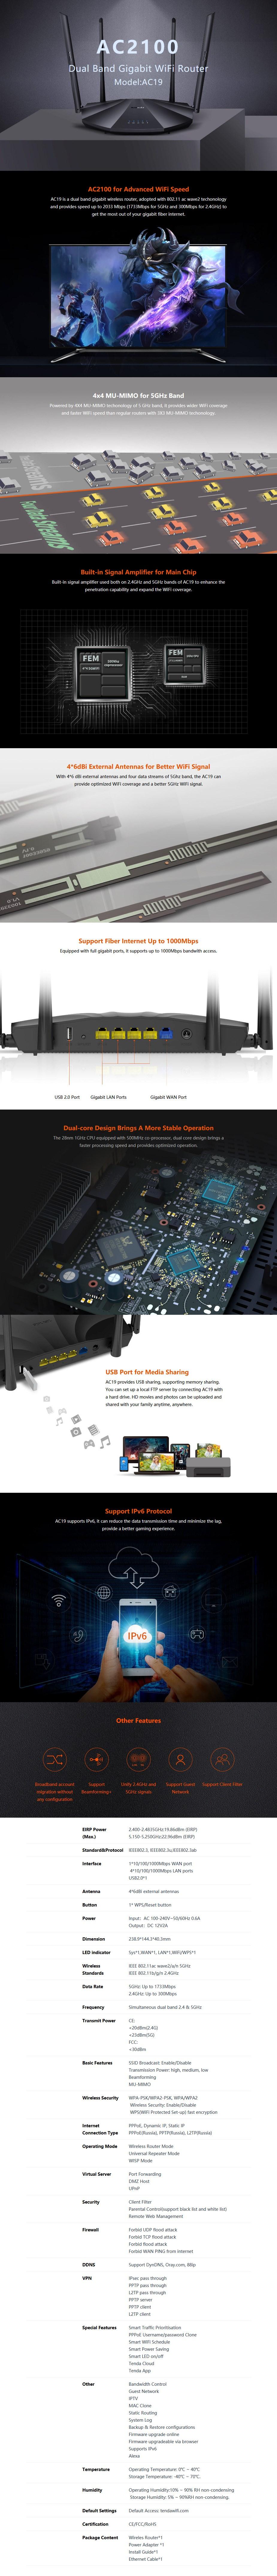 Tenda AC19 AC2100 Dual-Band Gigabit WiFi Router - Overview 1